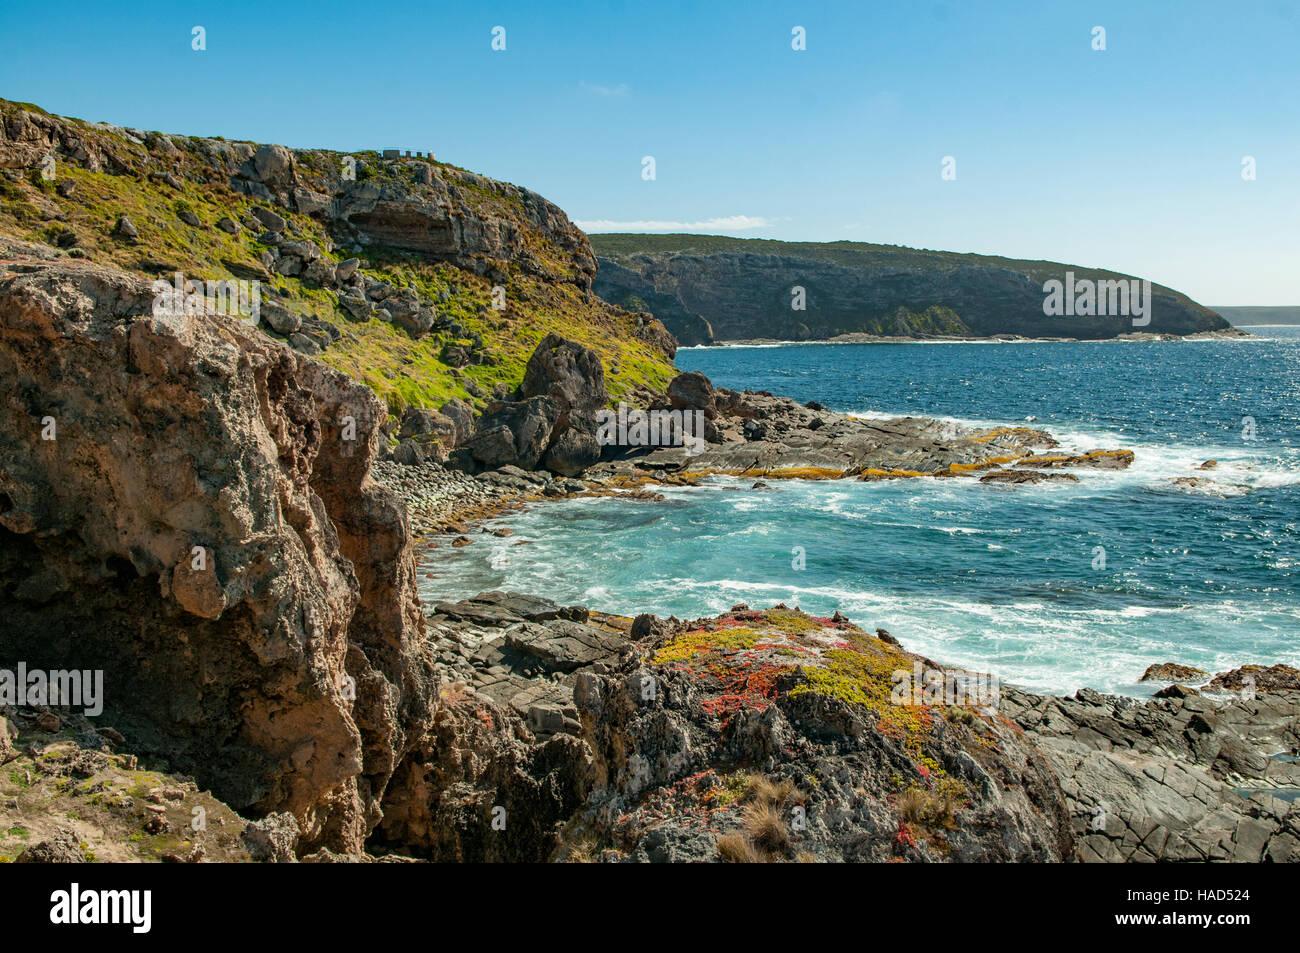 View from Cape Couedic, Kangaroo Island, South Australia, Australia Stock Photo